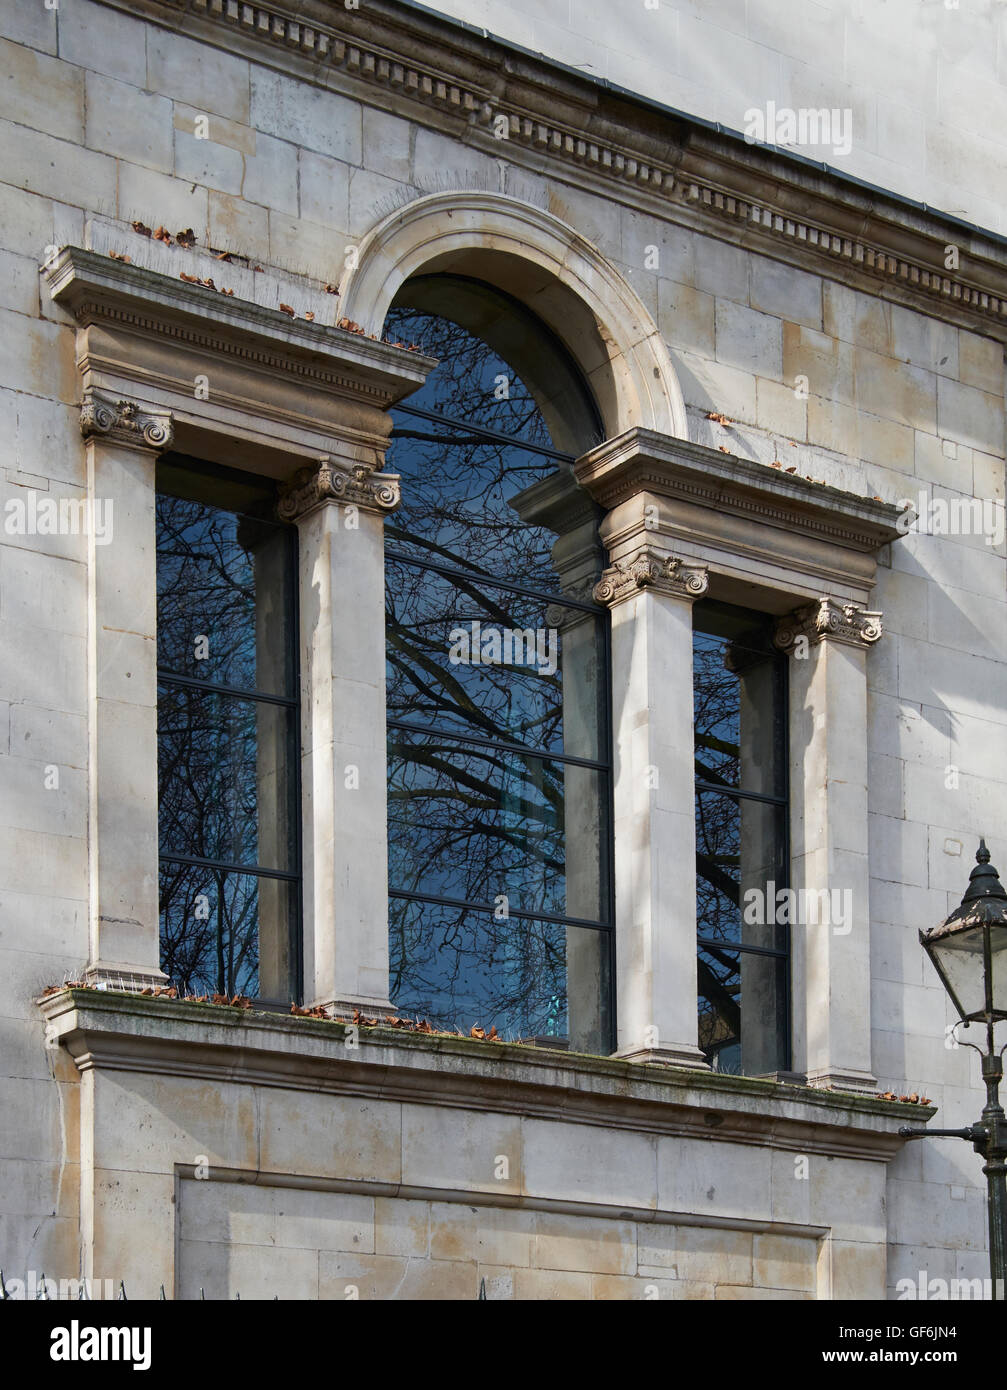 St Luke Old Street, Venetian window. Probably the joint design of John James and Nicholas Hawksmoor, 1727-1733. - Stock Image